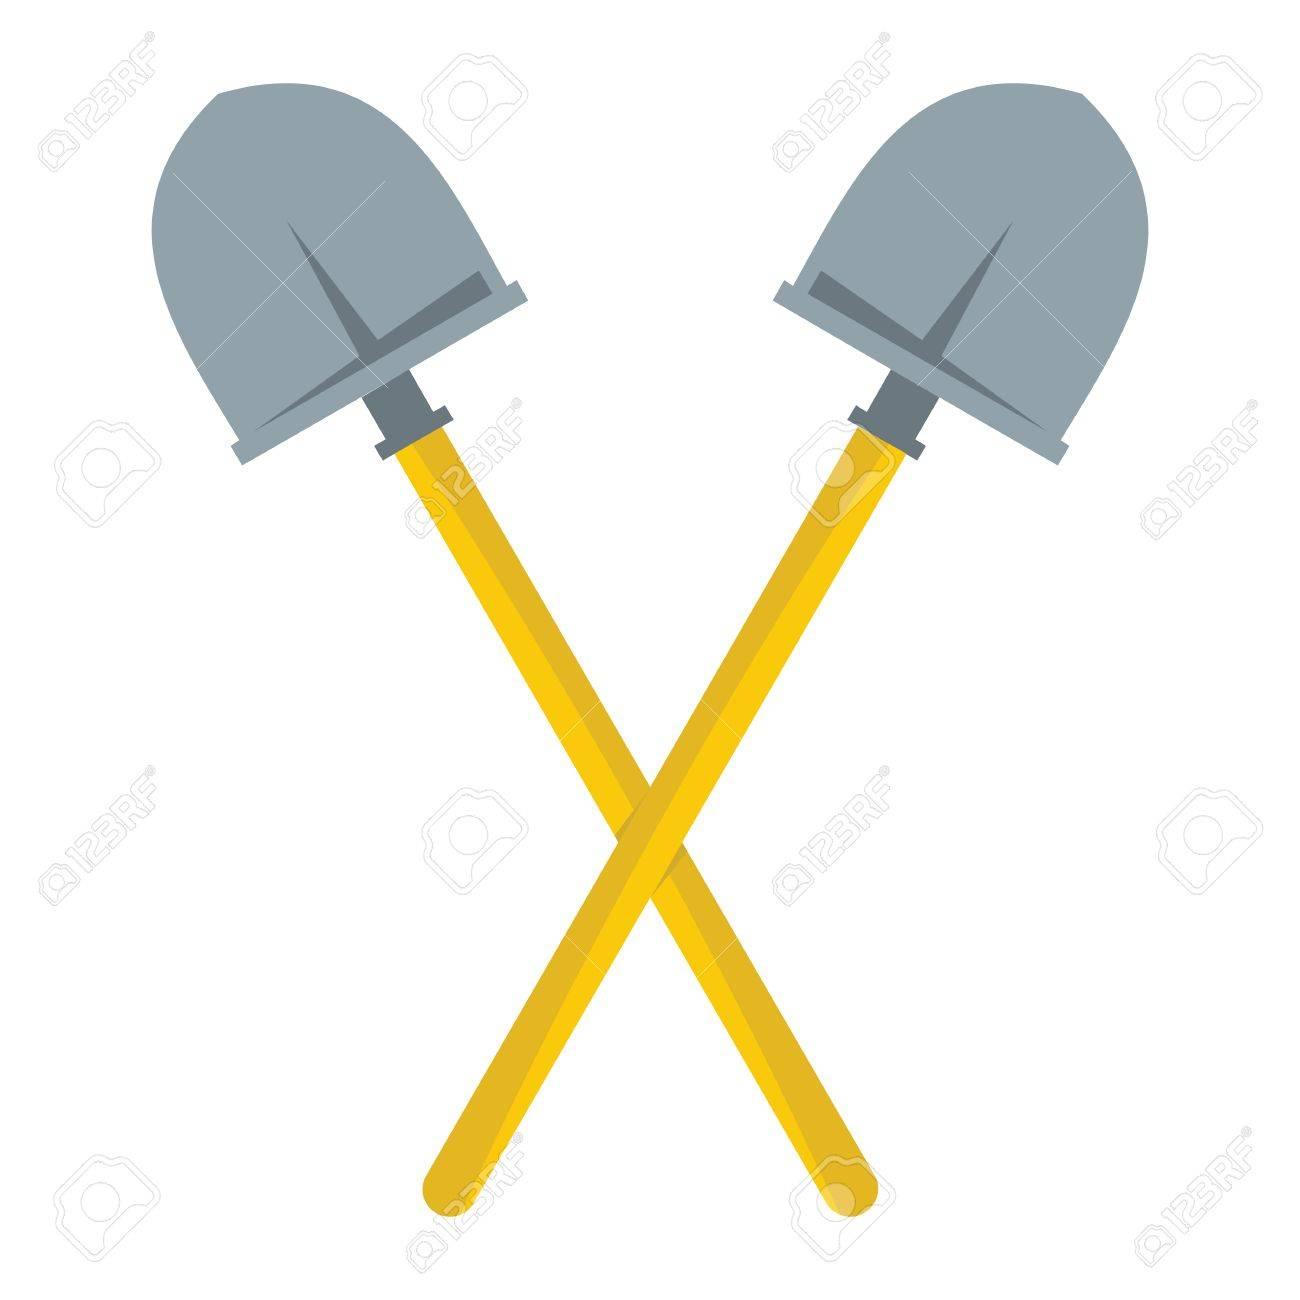 crossed shovels flat cartoon icon shovels vector illustration